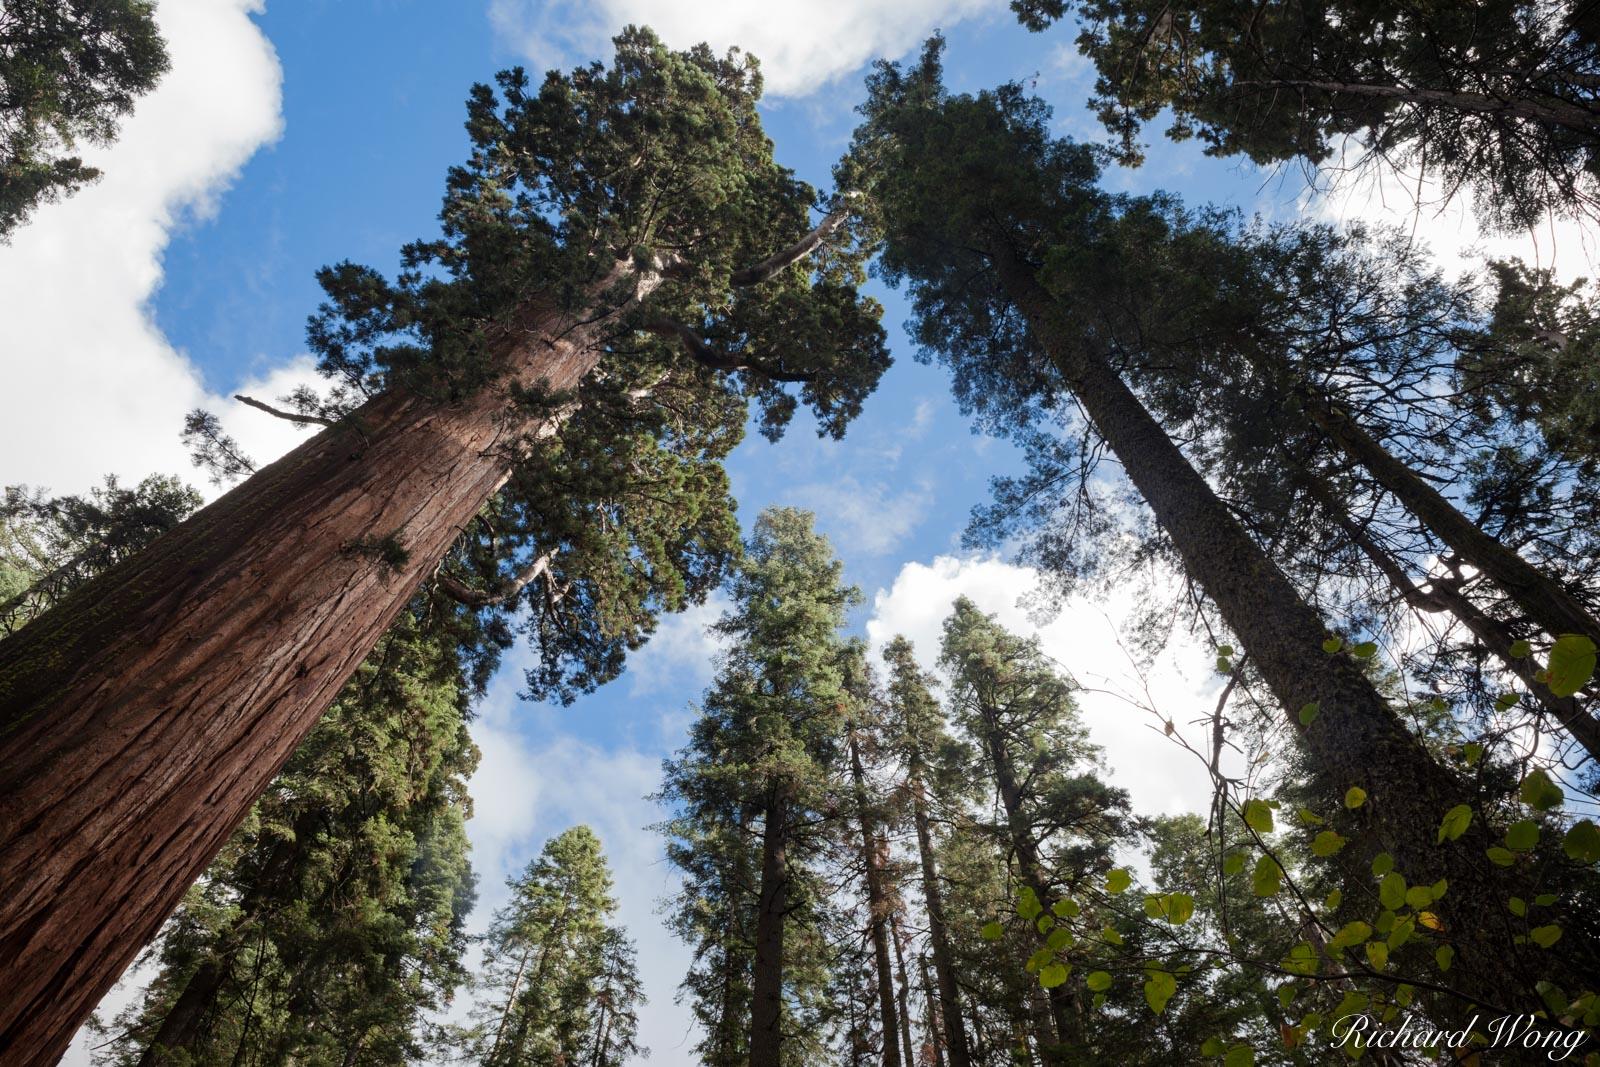 Giant Sequoia Trees, Calaveras Big Trees State Park, California, photo, photo